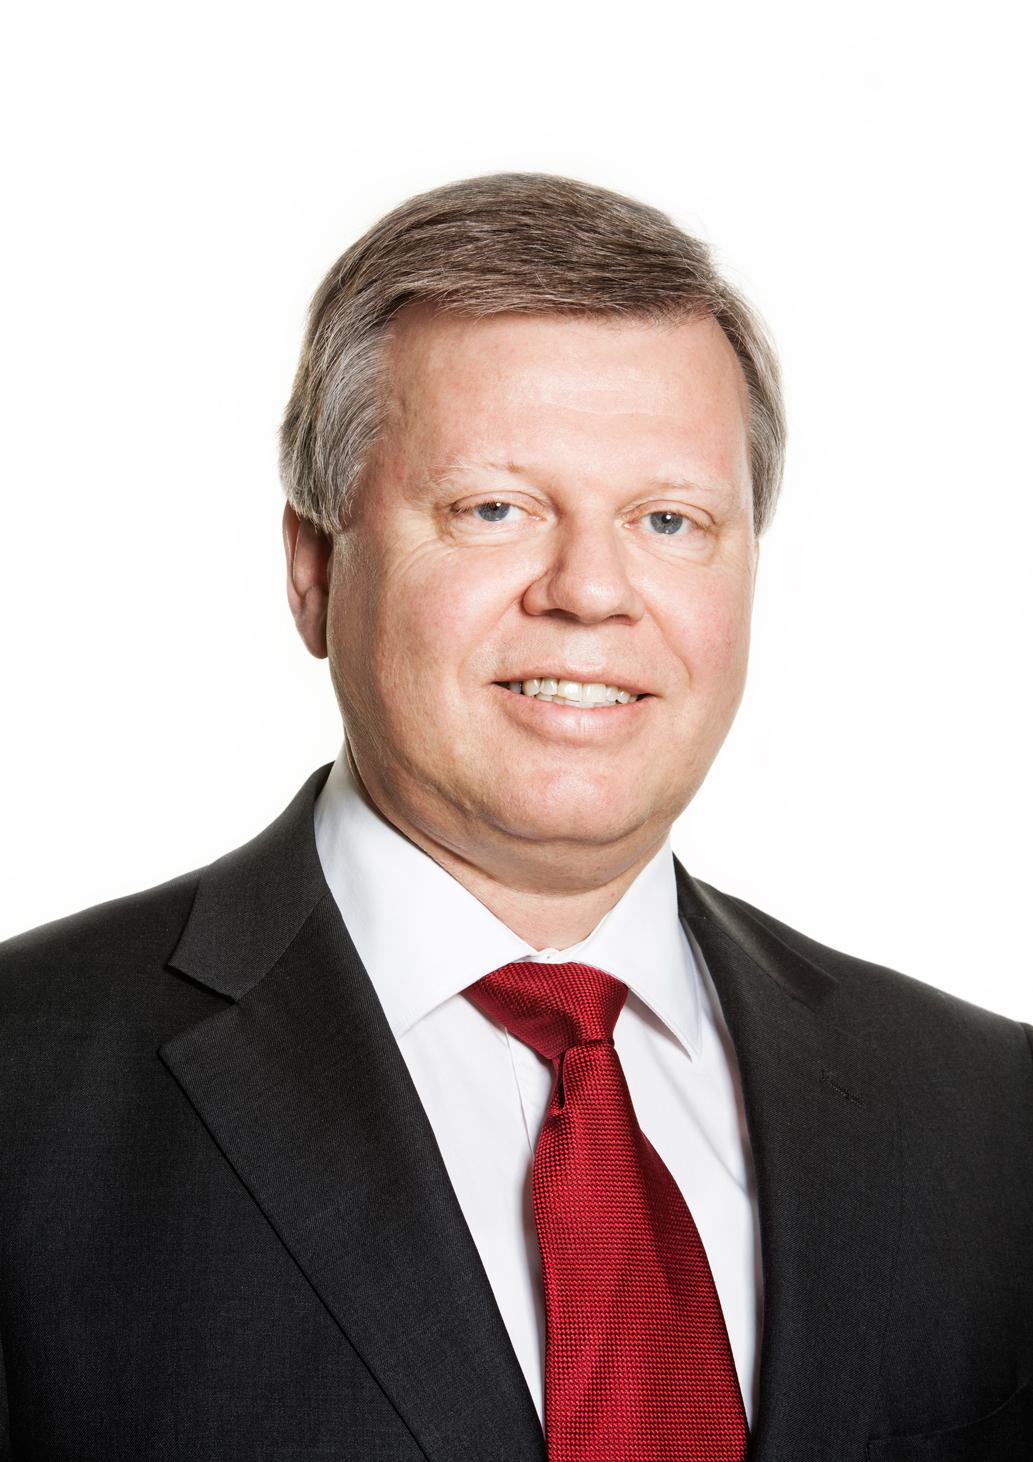 Reidar Hustoft -appointment